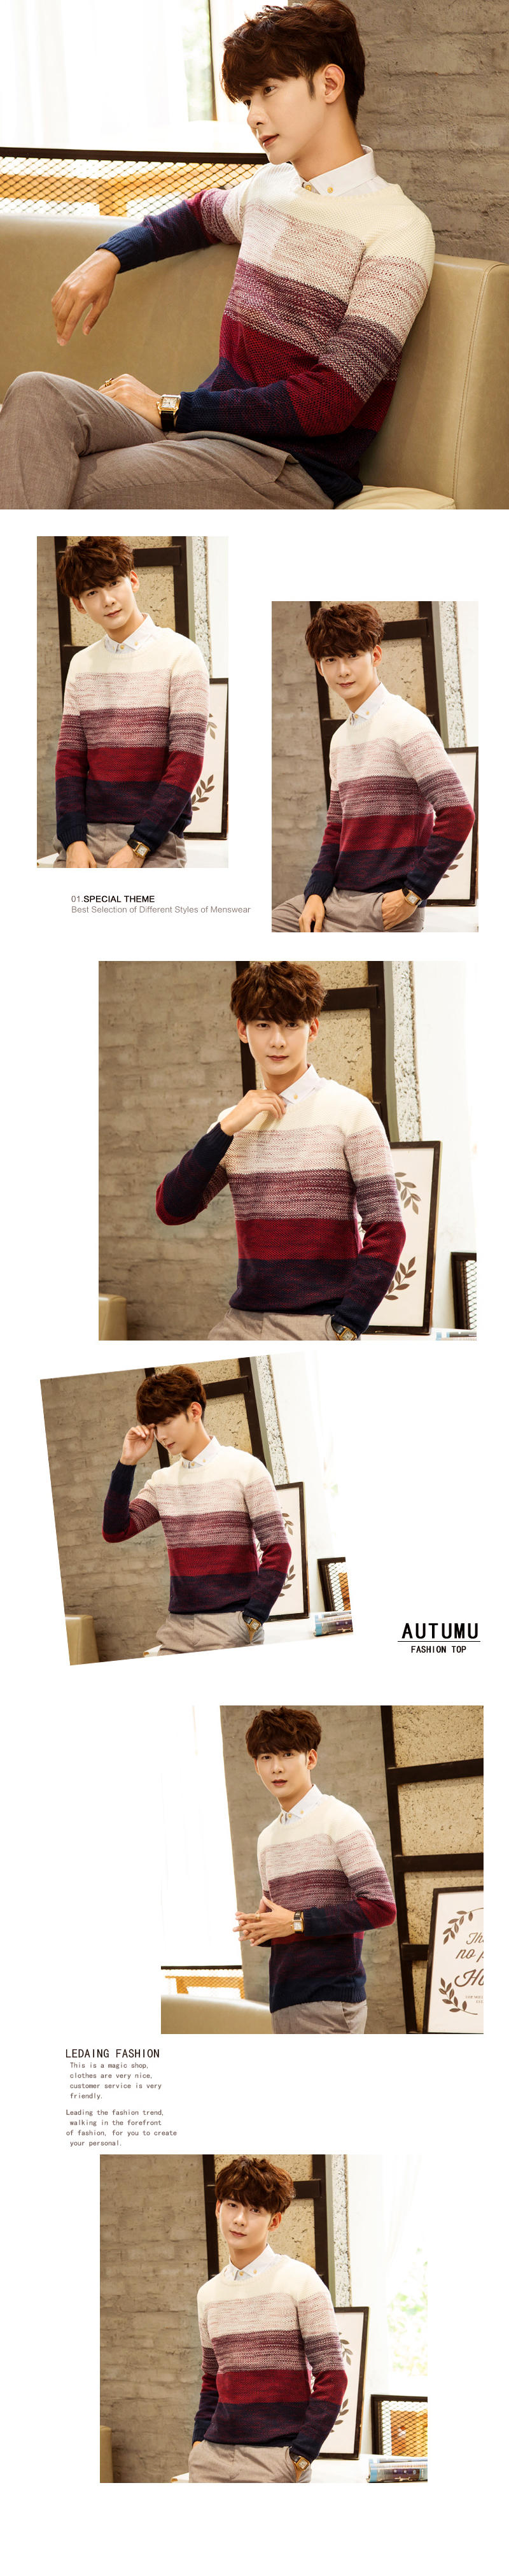 Áo len đỏ al88 - 1